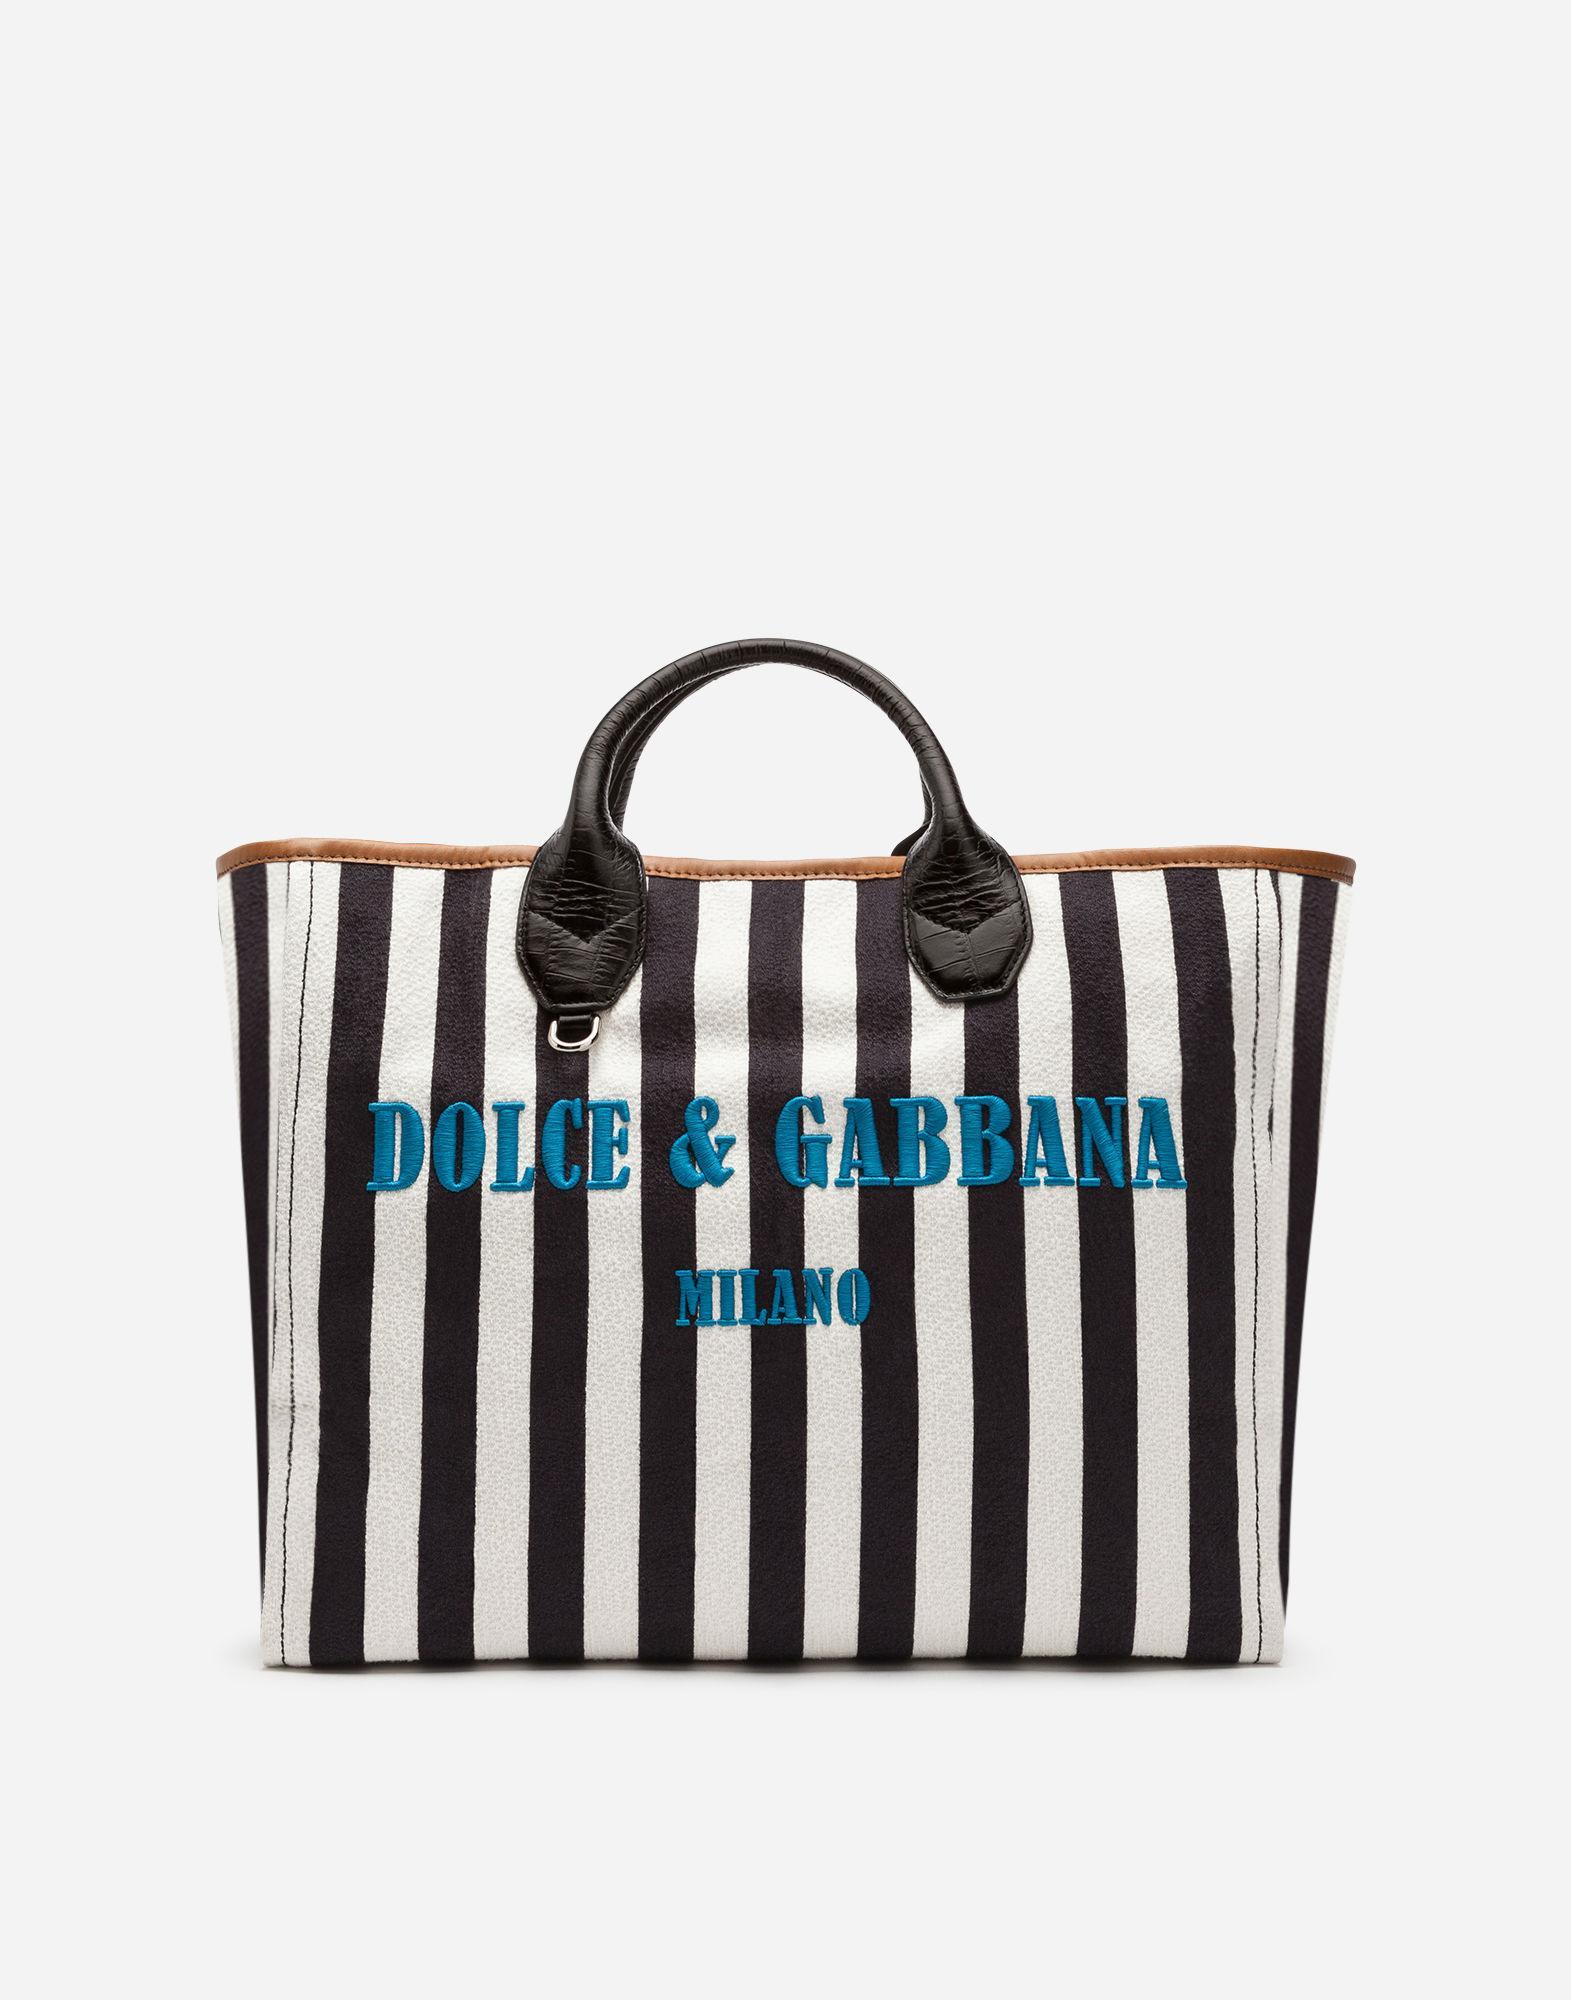 Dolce & Gabbana Capri Wicker Shopping Handbag In White